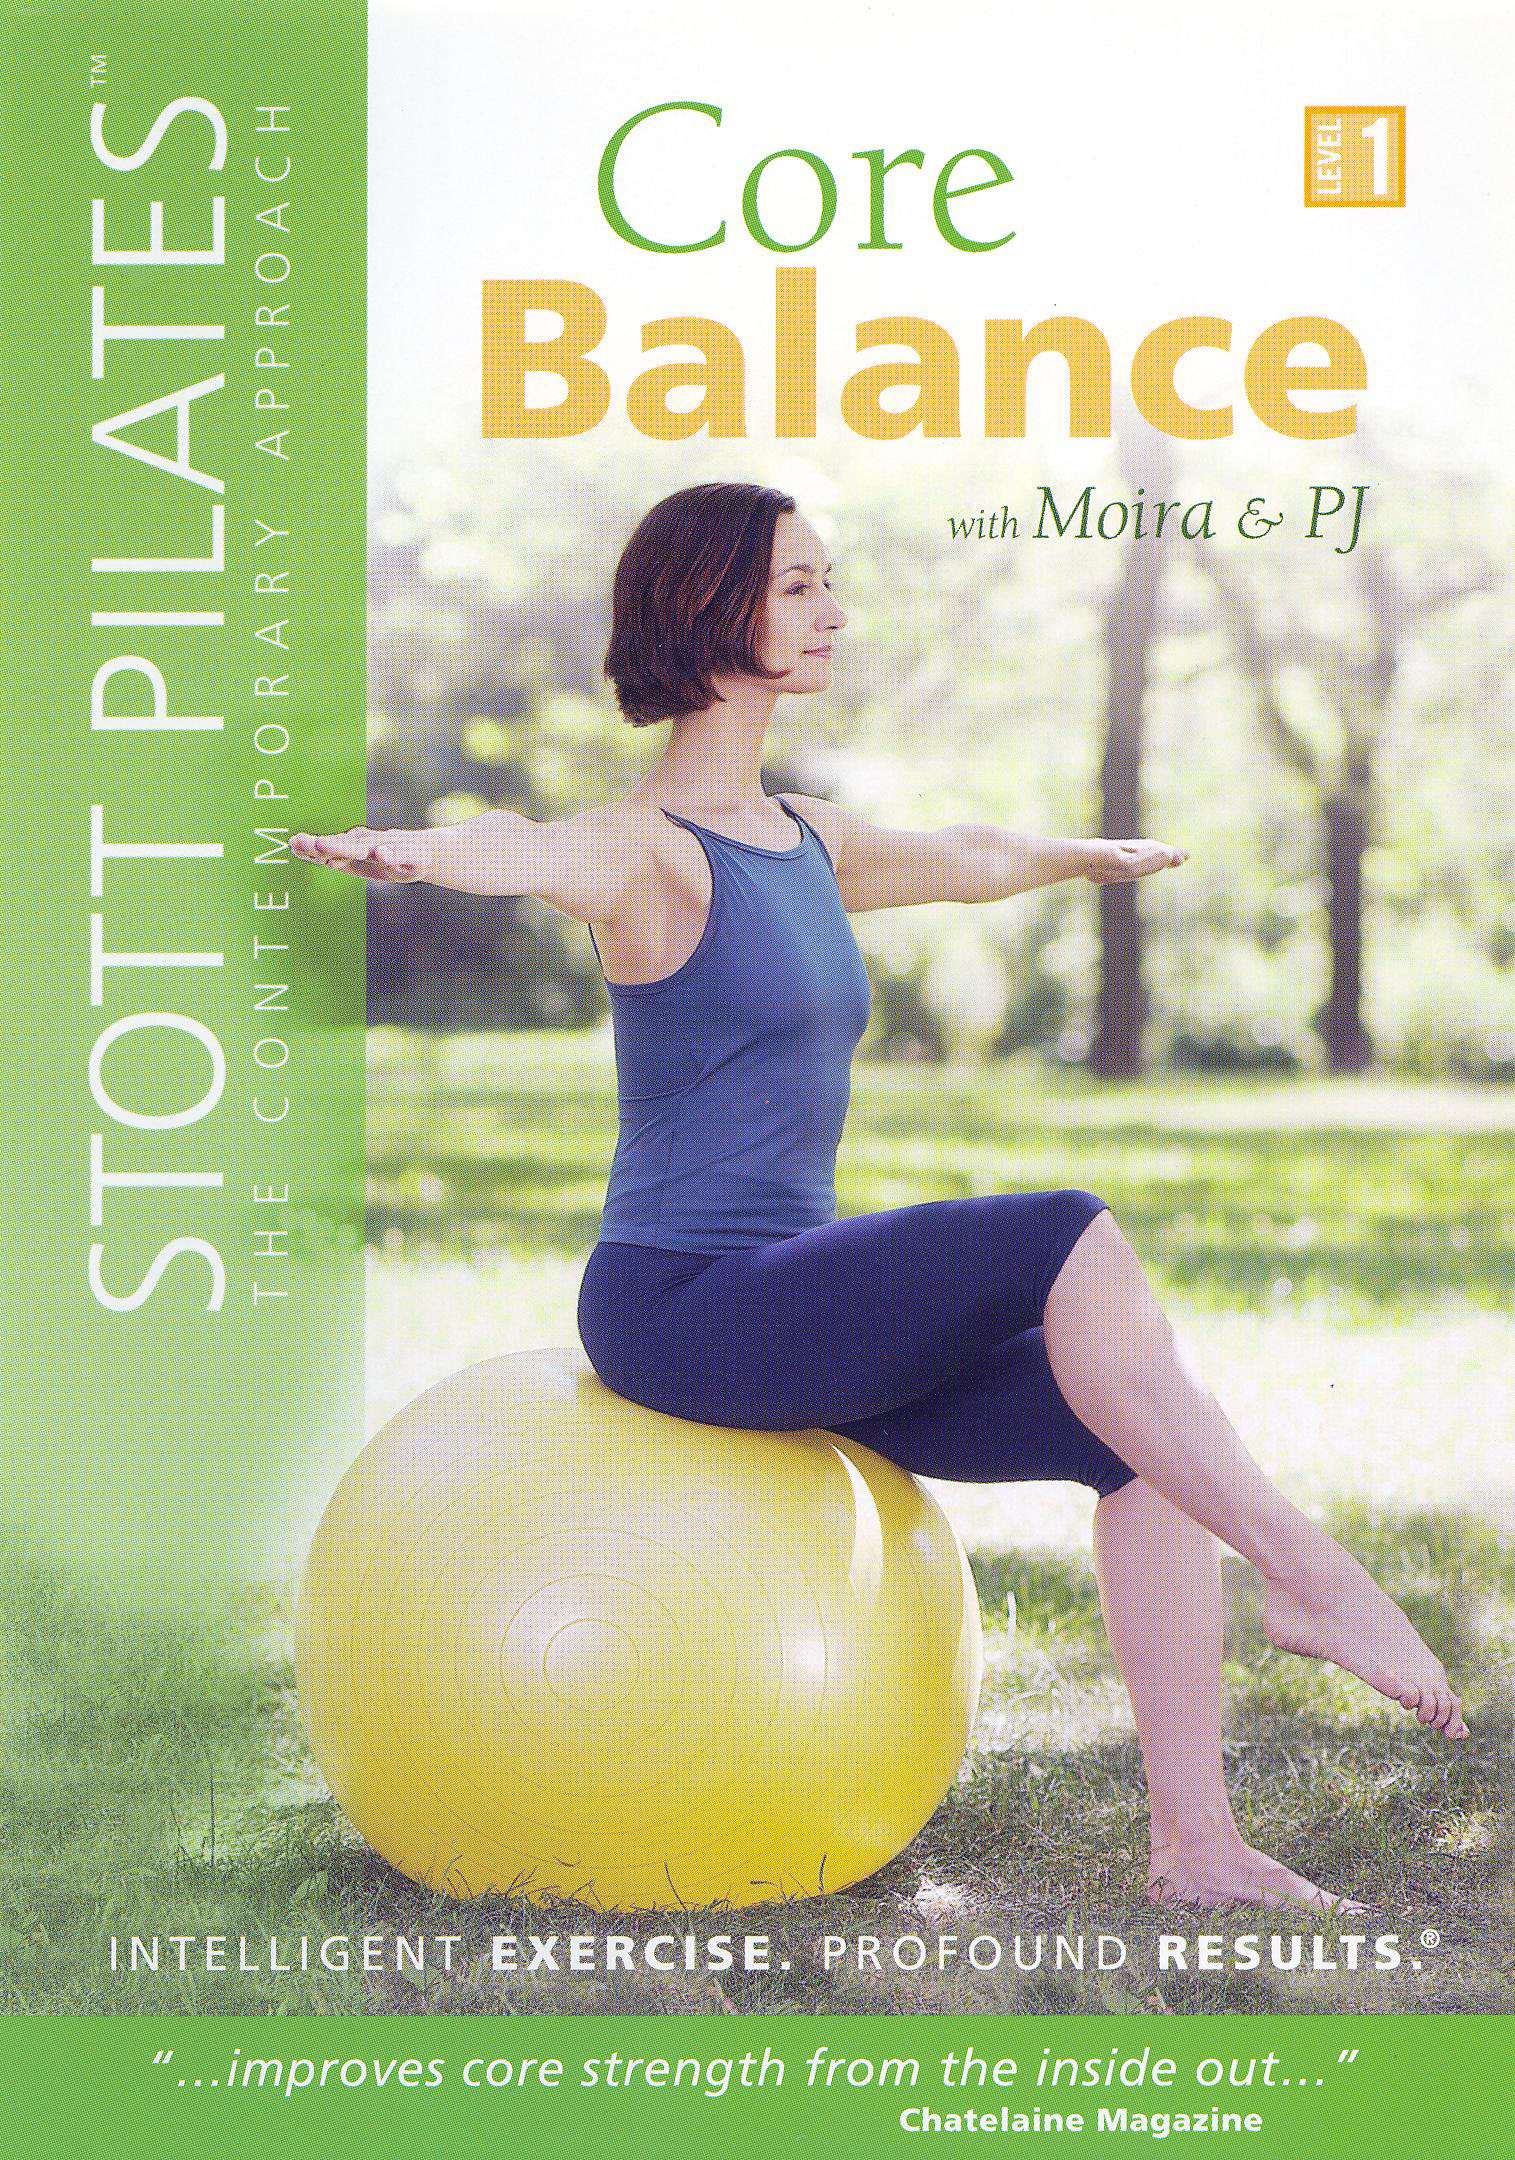 Stott Pilates: Stability Ball - Core Balance